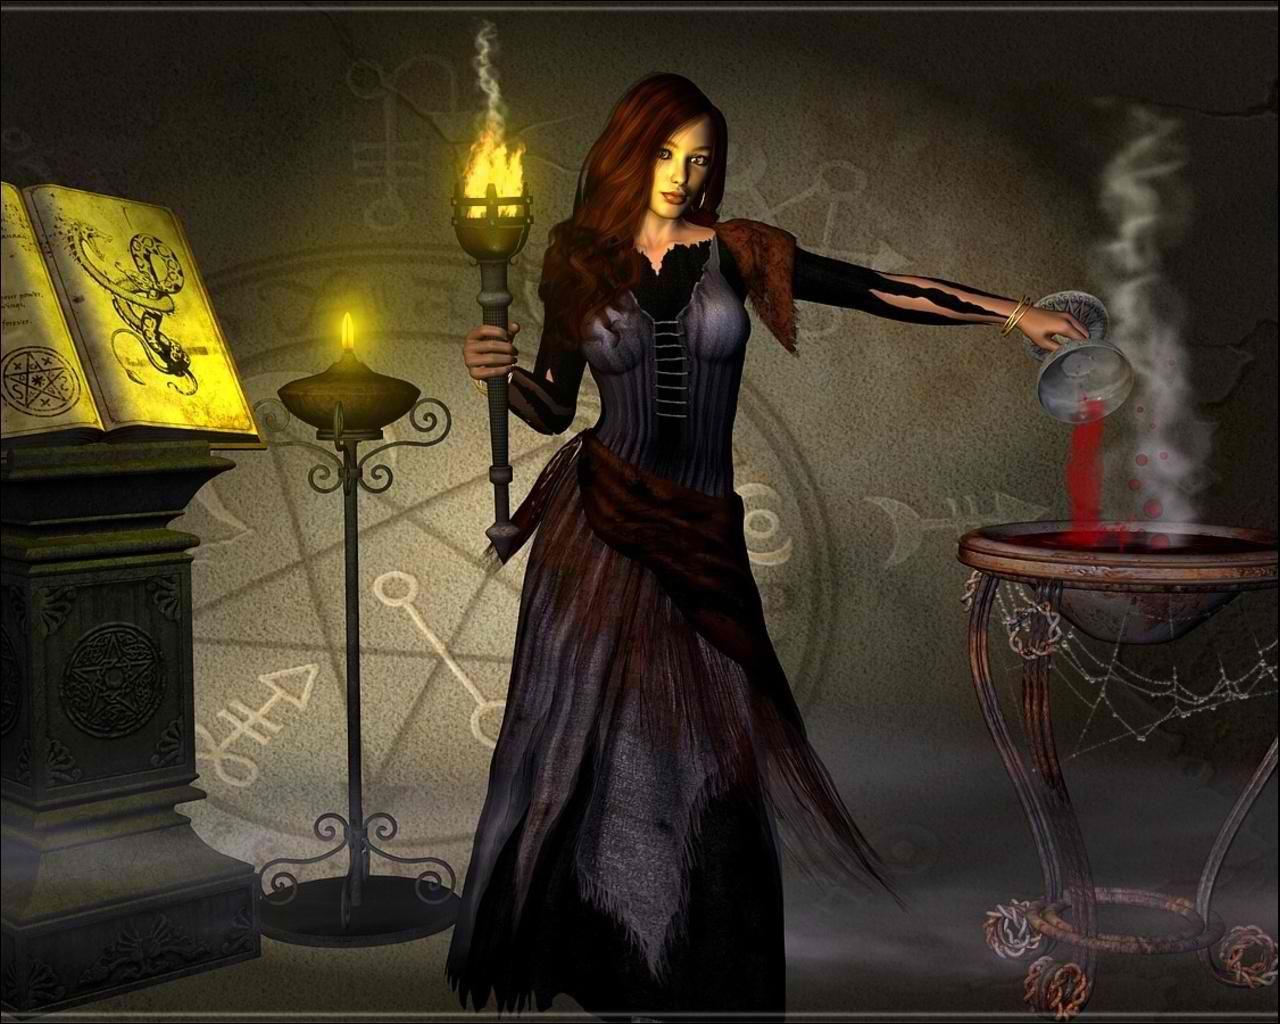 witch fantasy occult dark art artwork magic wizard mage